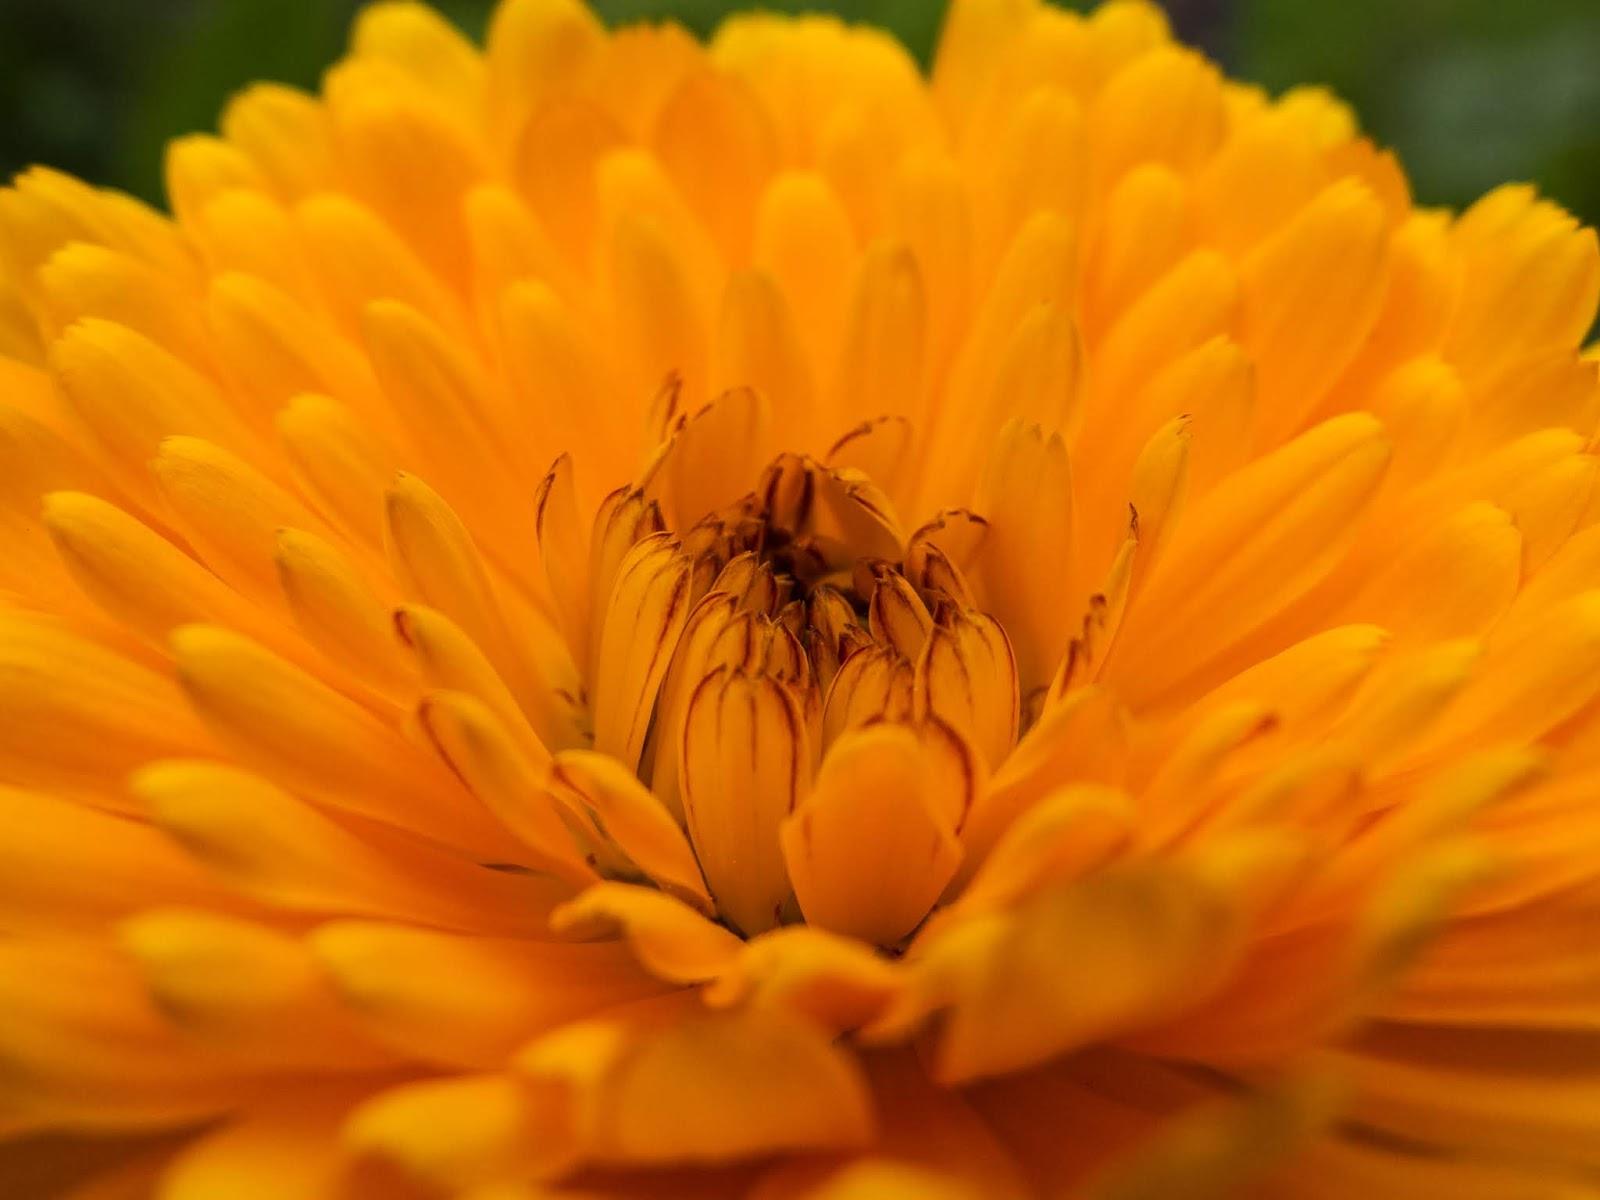 A close up of an orange Calendula flower.